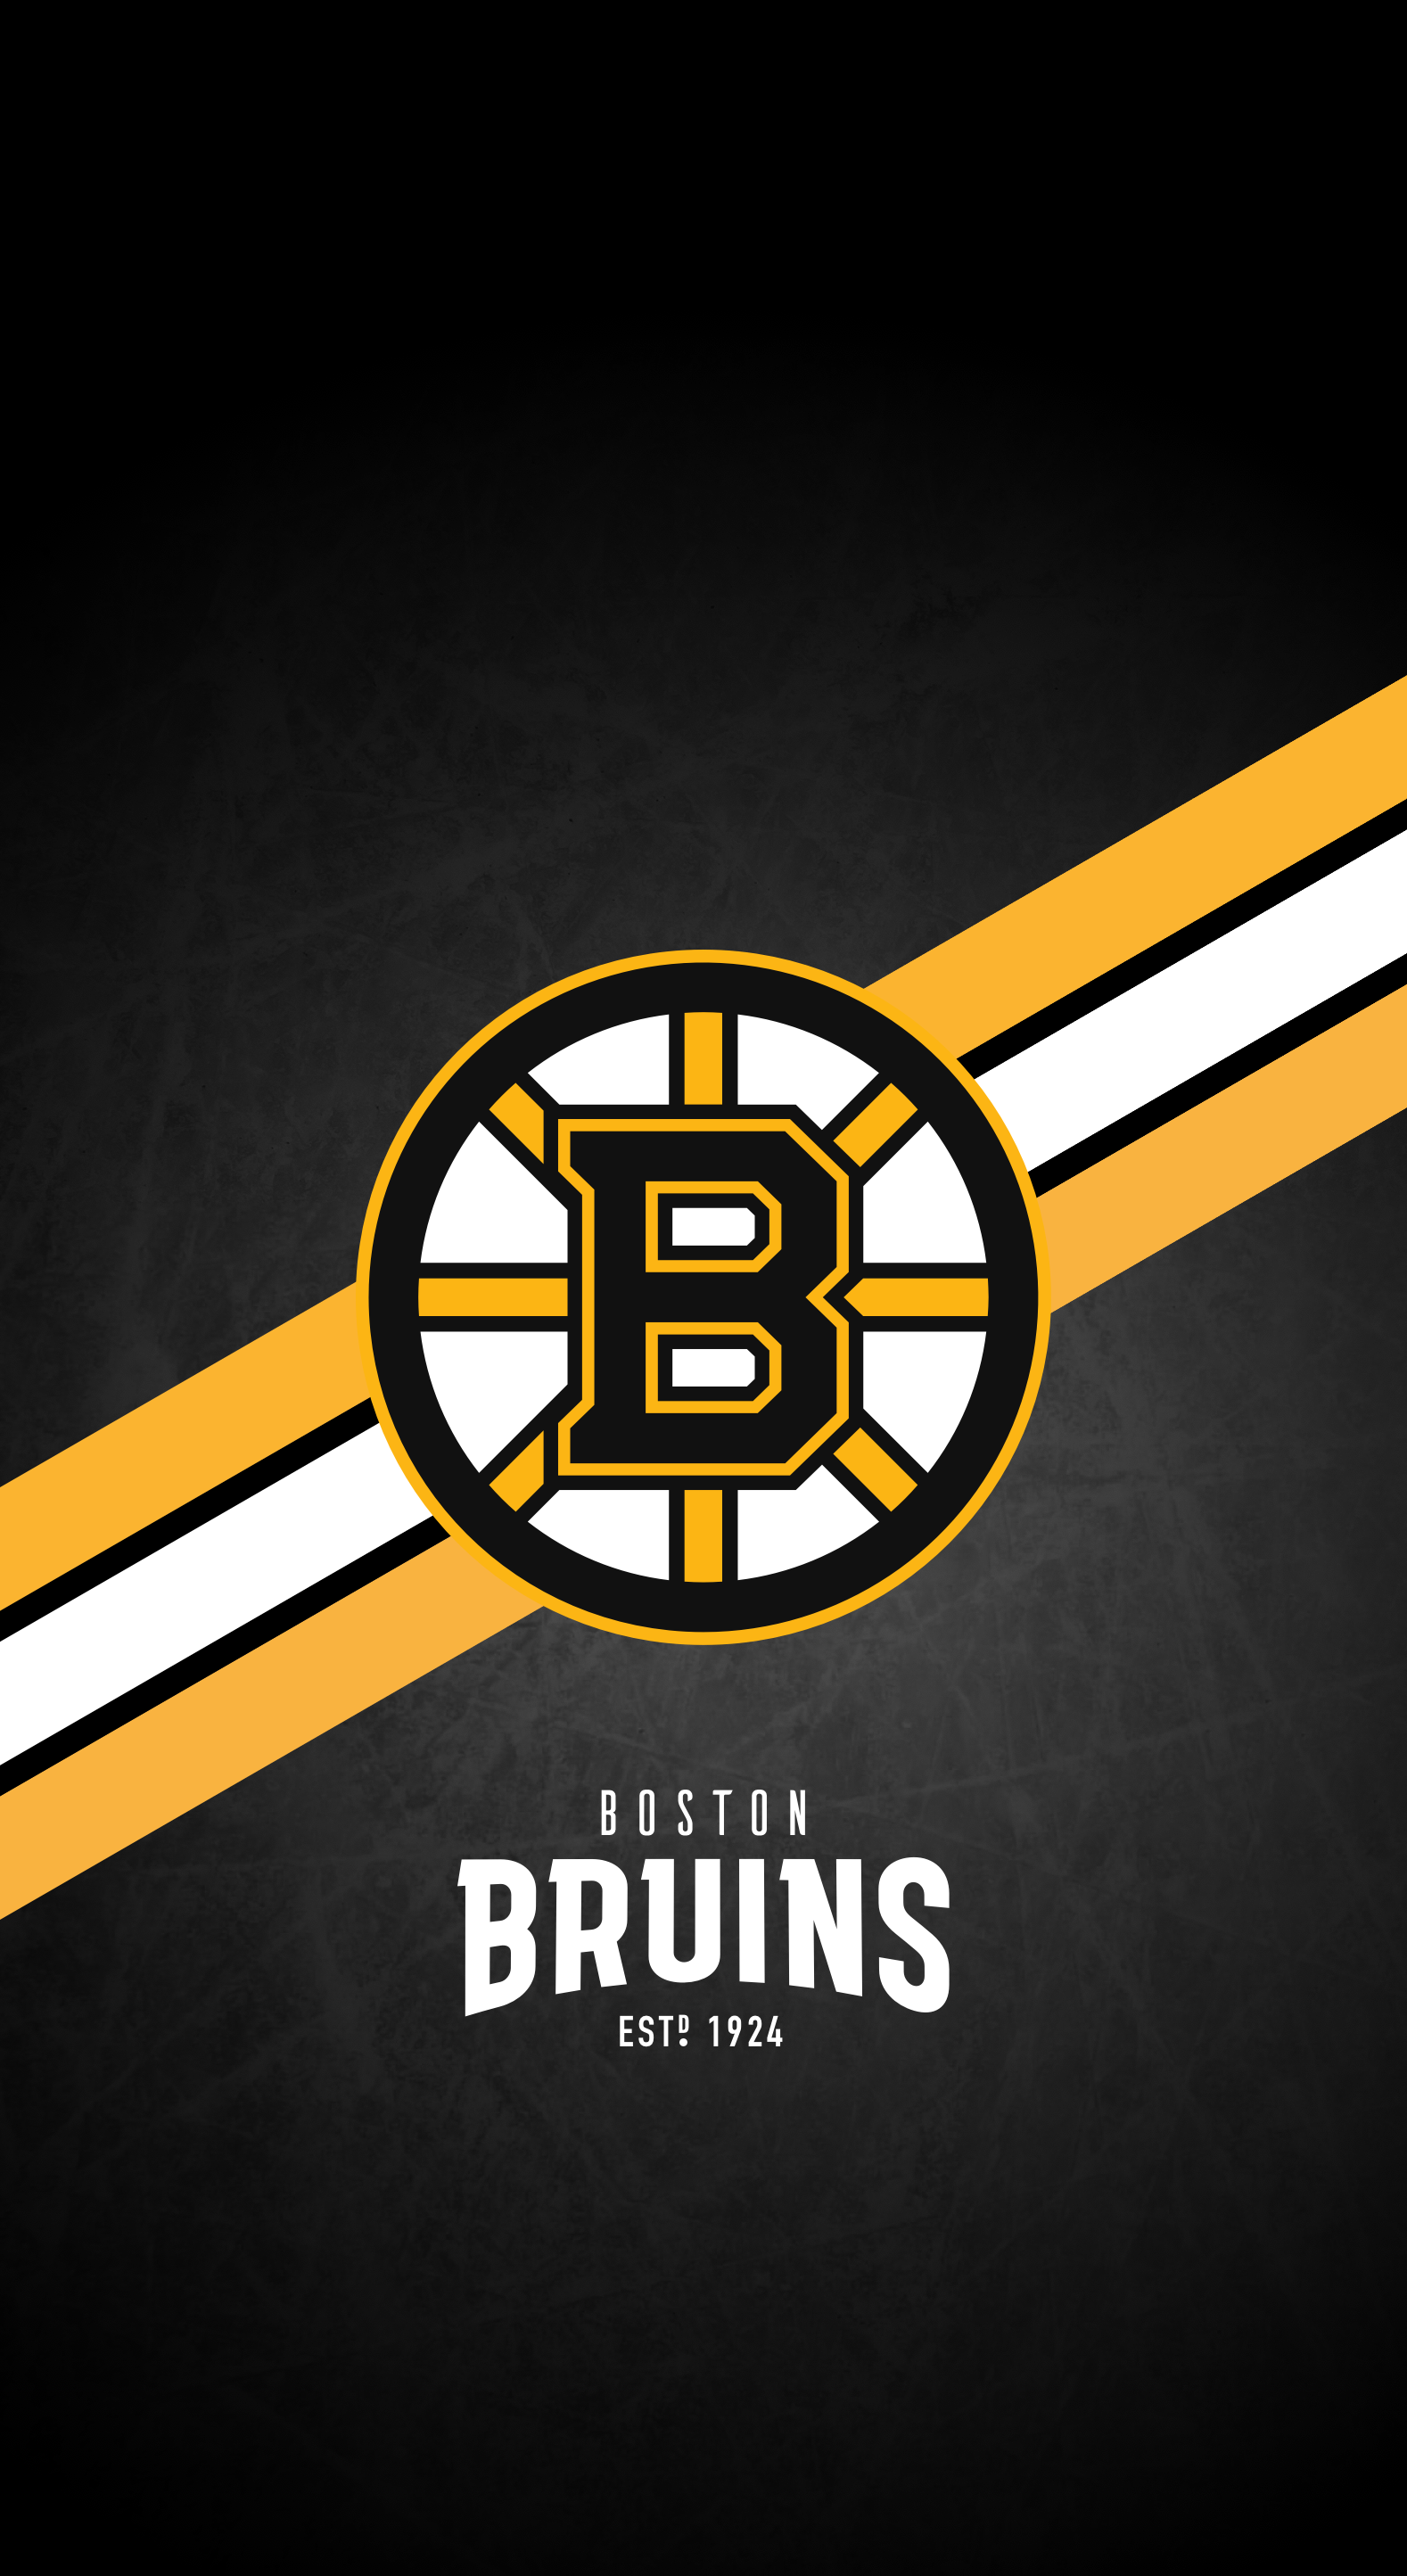 Boston Bruins Nhl Iphone X Xs Xr Lock Screen Wallpaper Boston Bruins Boston Bruins Wallpaper Boston Bruins Logo